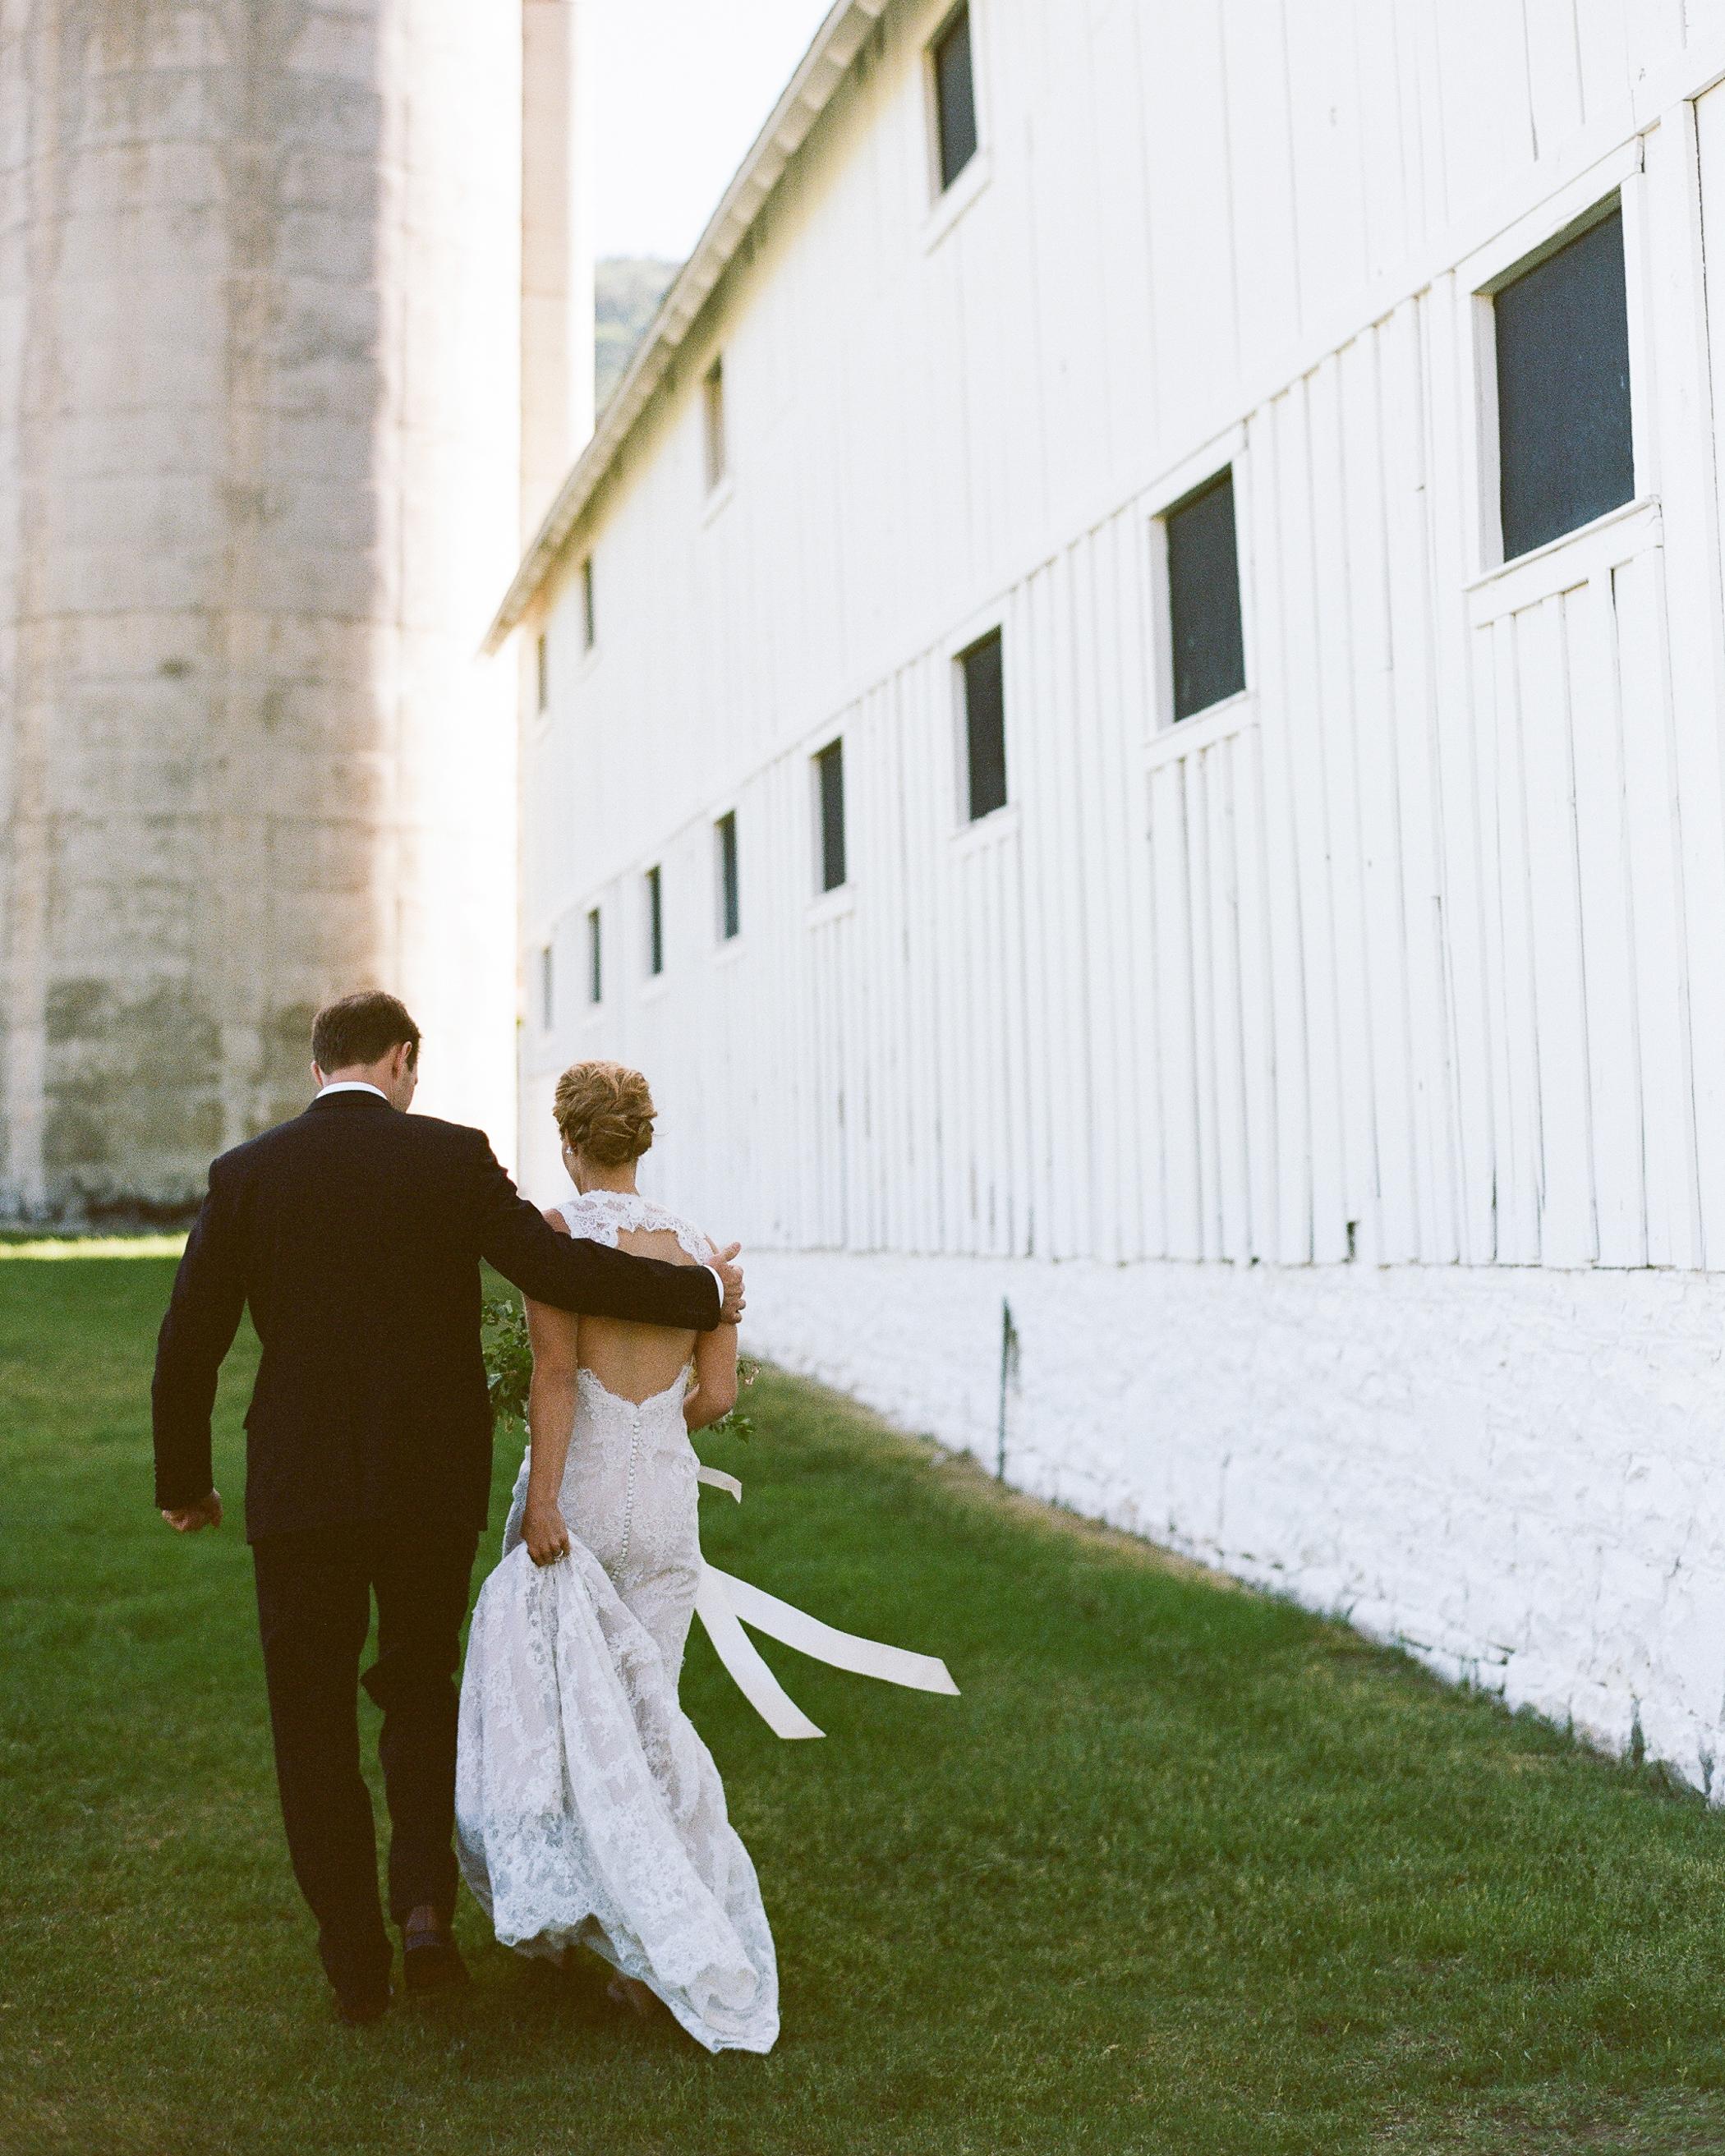 jamie-alex-wedding-walking-186-s111544-1014.jpg